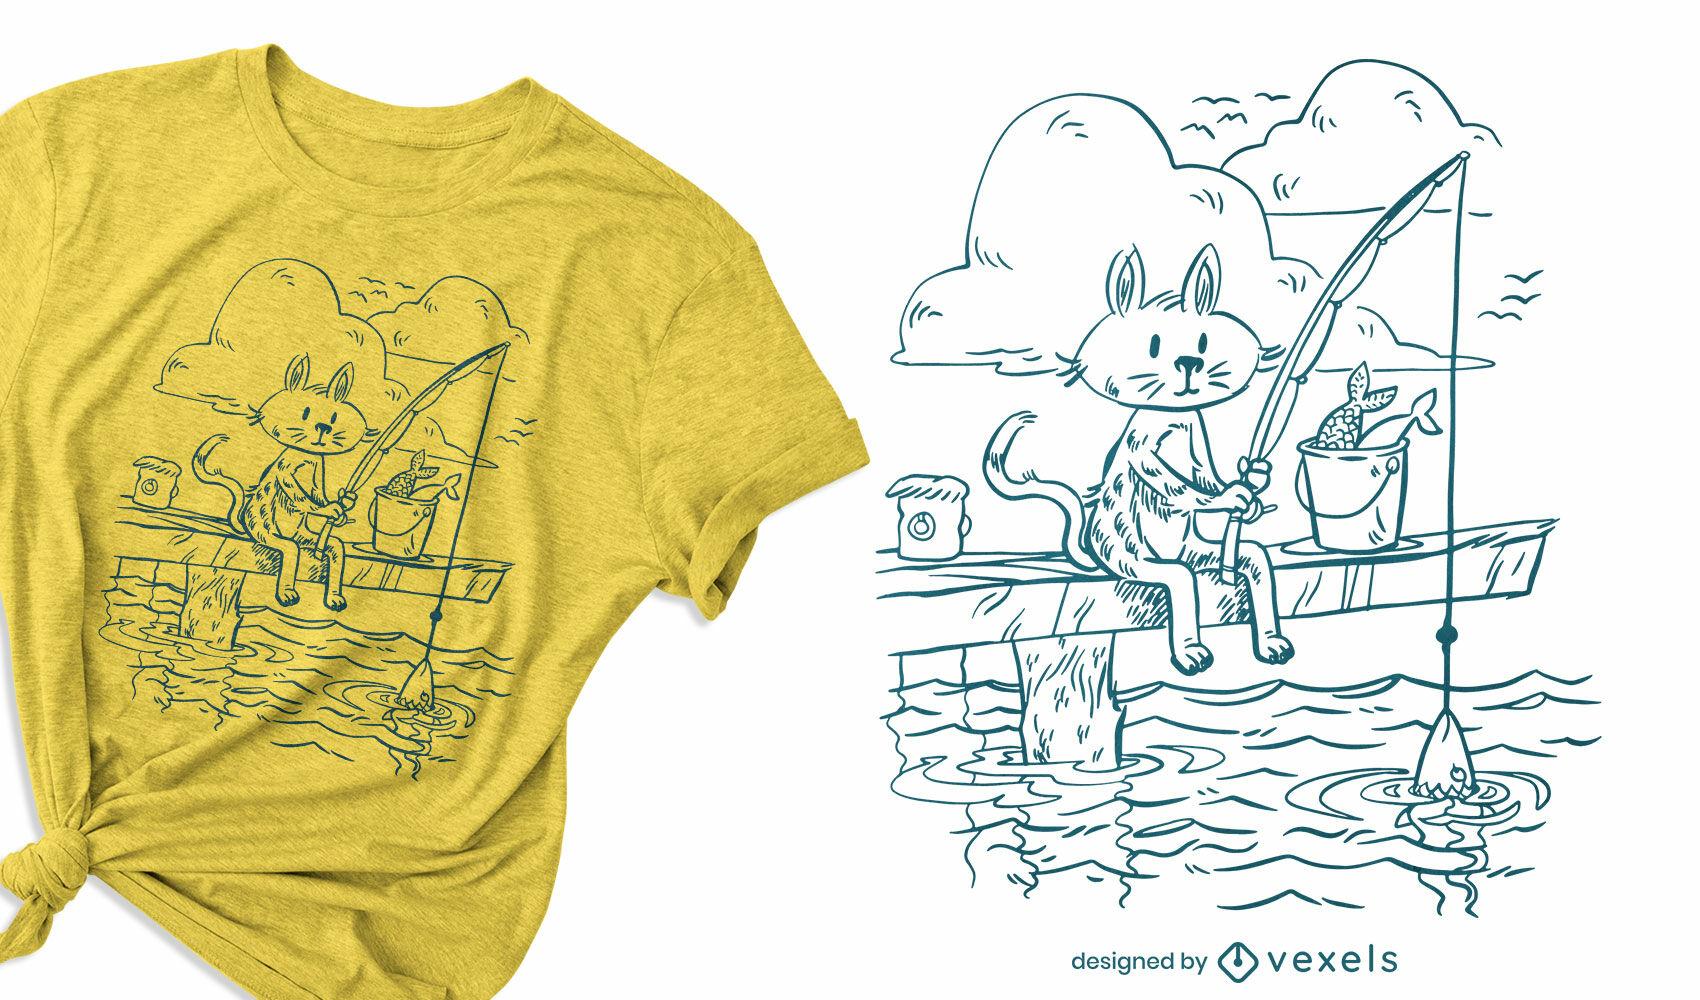 Fishing cat doodle t-shirt design